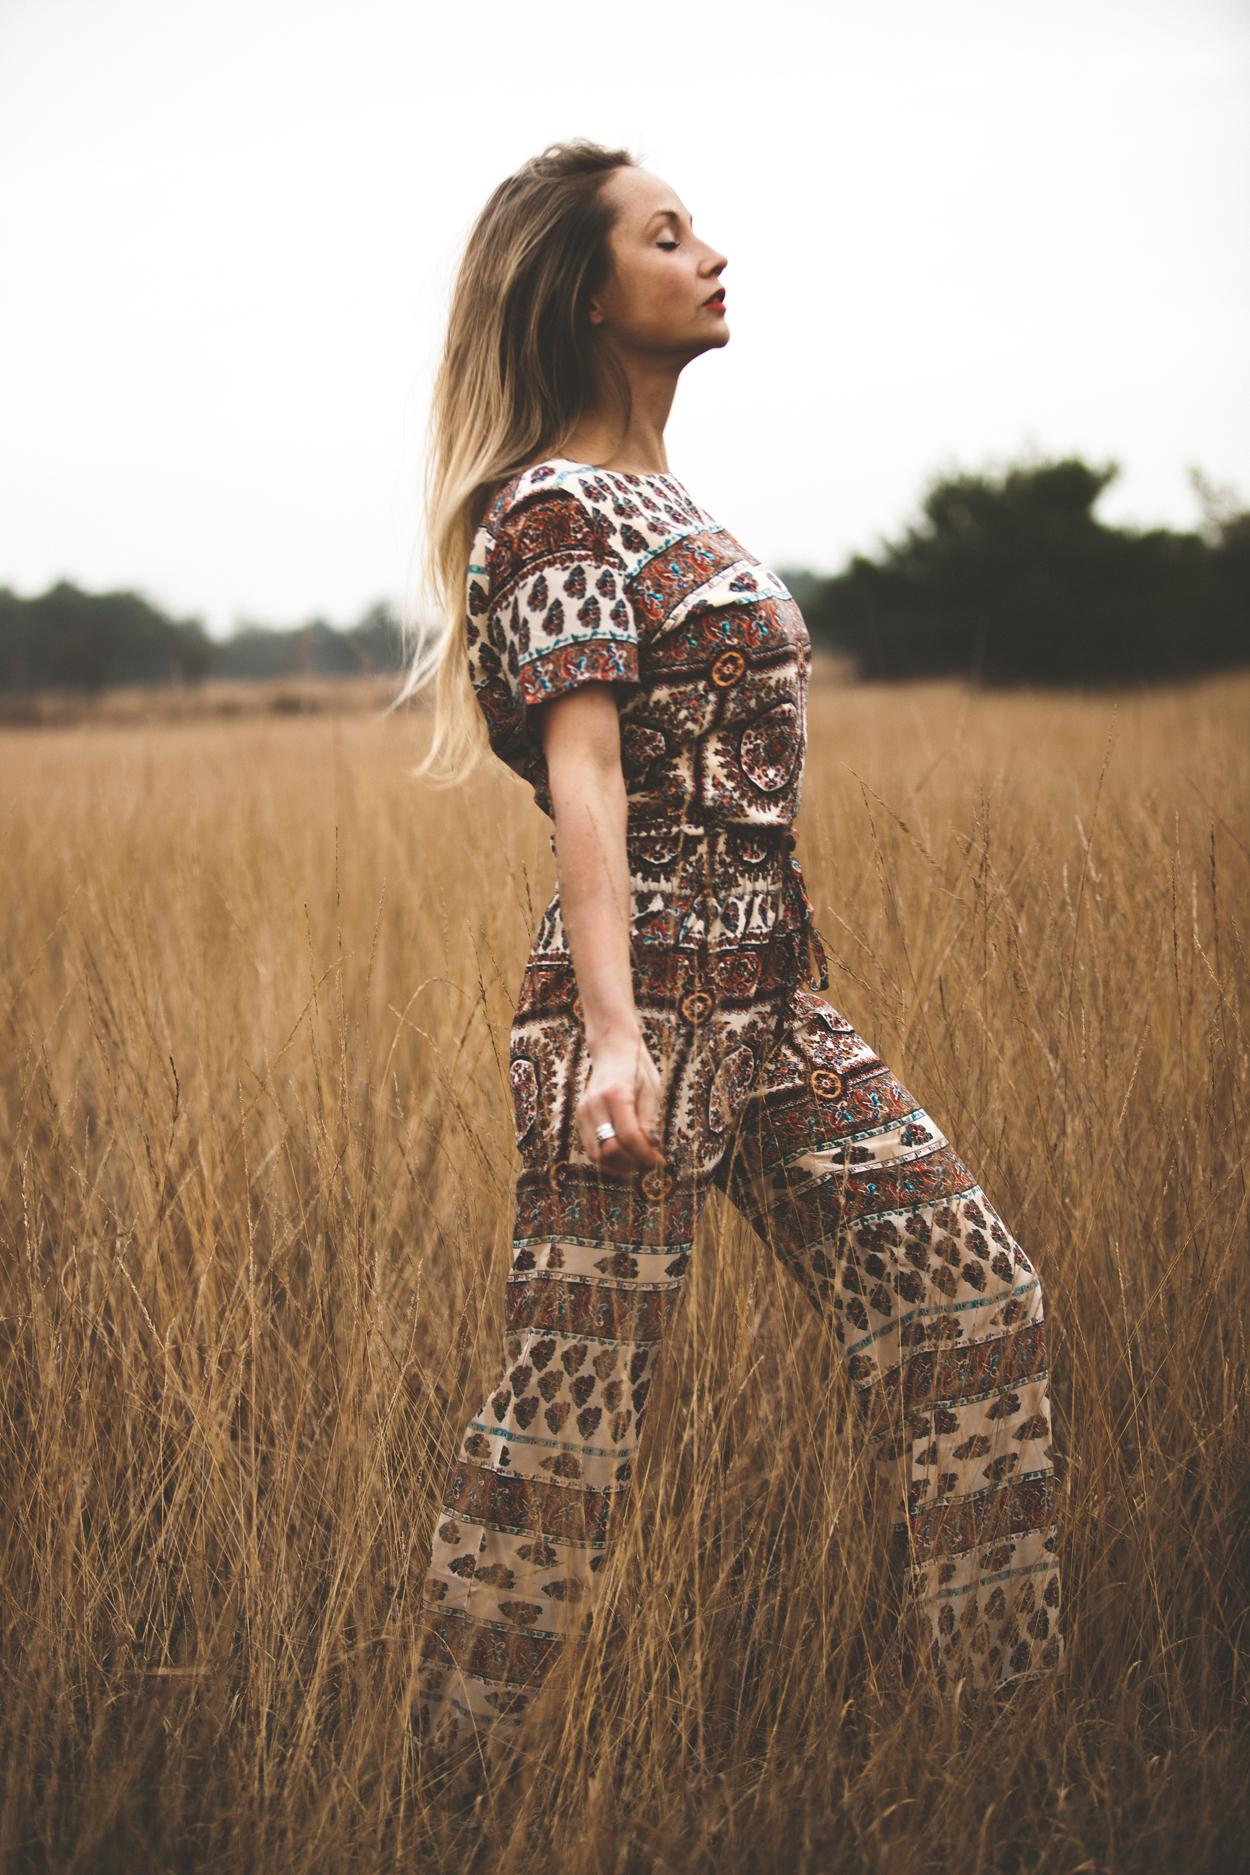 so_cee_carmen_heystek_lifestyle_blog_fashion_outfit_tips_styling_todays_favourites_modeblog_fitgirl_recept_glutenvrij_coeliakie_balans_mindfulness_mindset_drylake_1